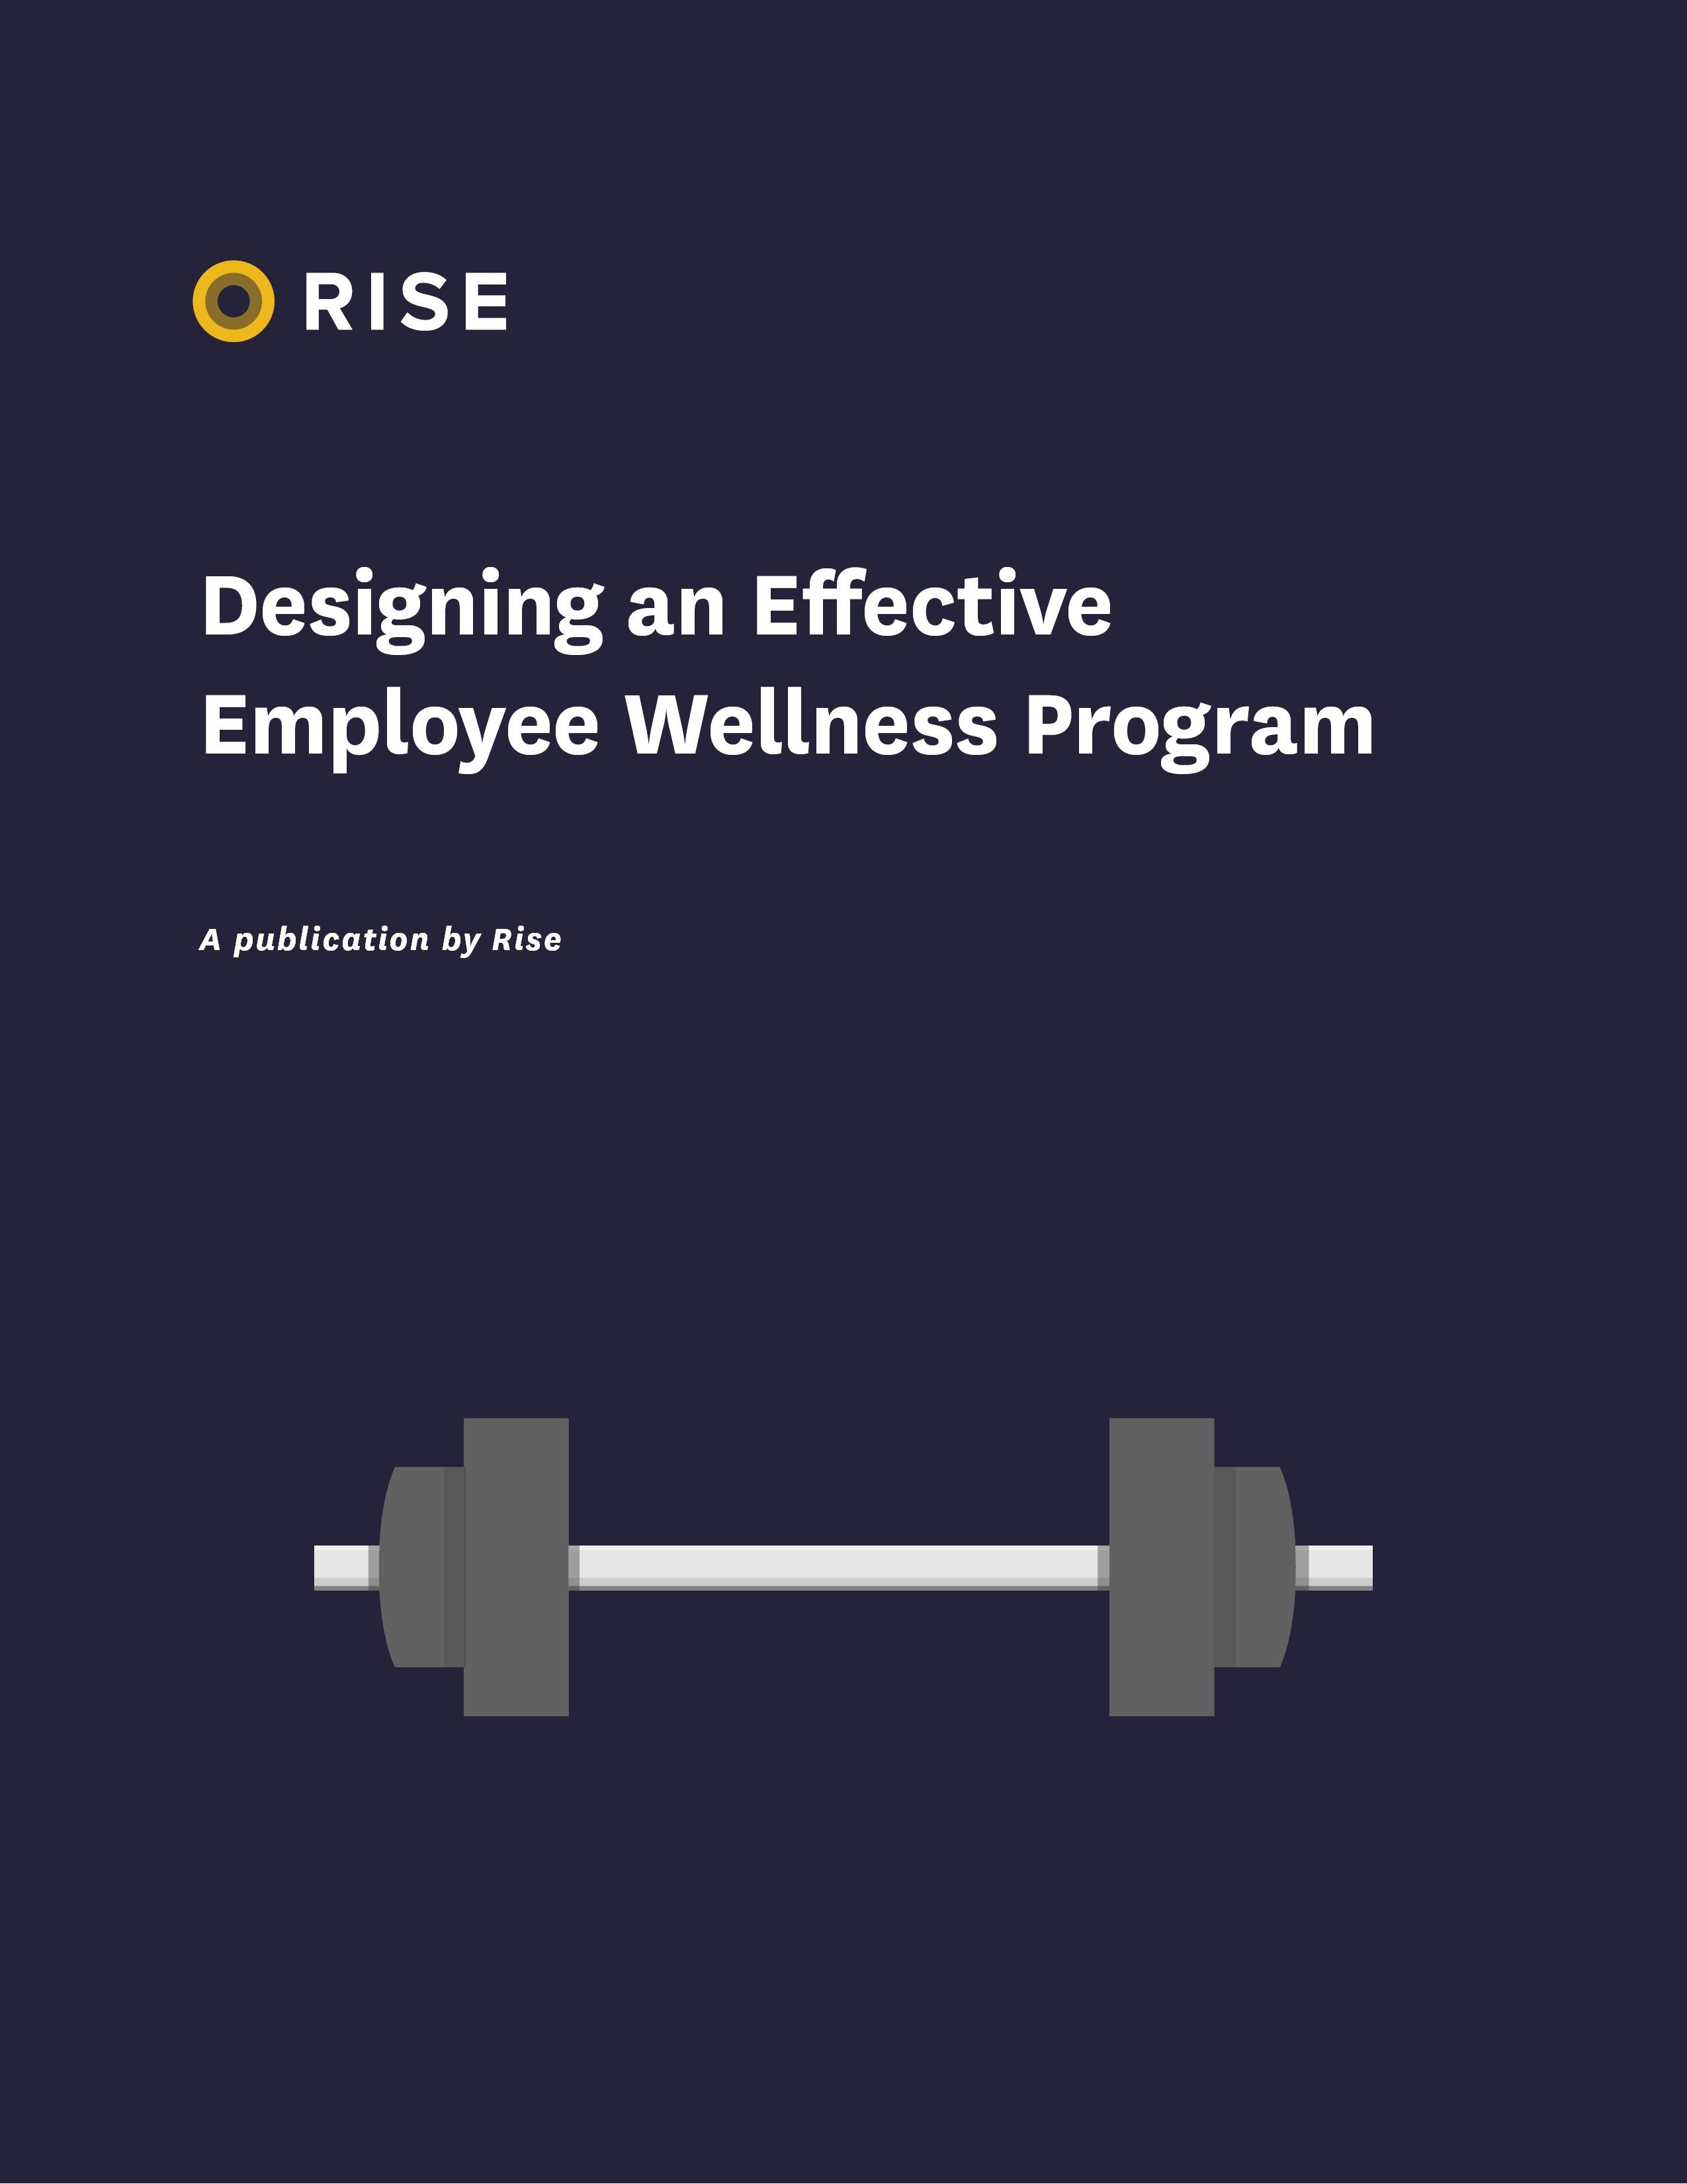 Rise-rebrand-employee-wellness-program.jpg